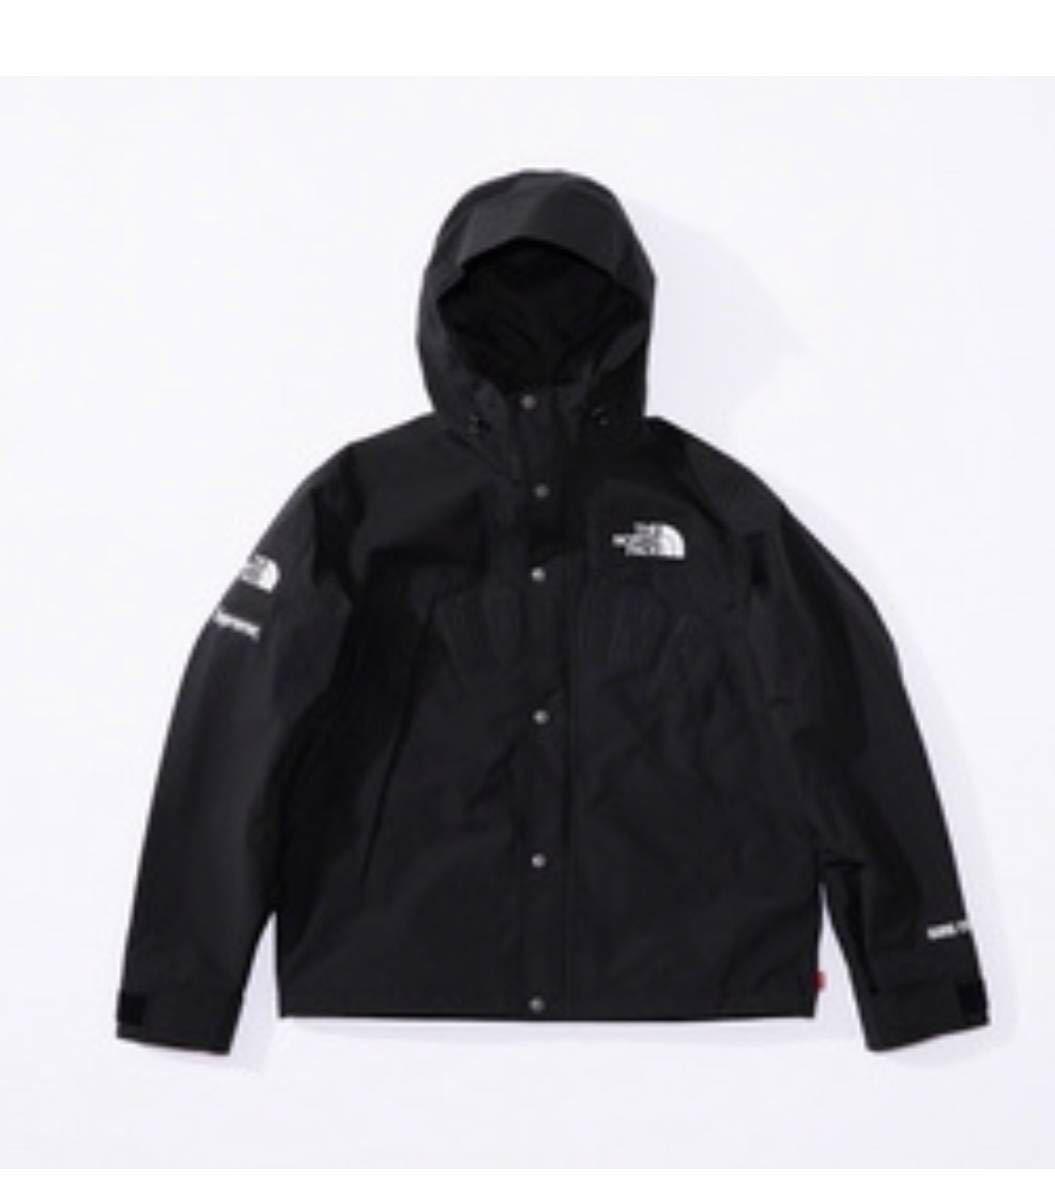 Sサイズ Supreme / The North Face Arc Logo Mauntain Parka Black 黒 新品未使用 ノース マンパ アーチ 国内正規品